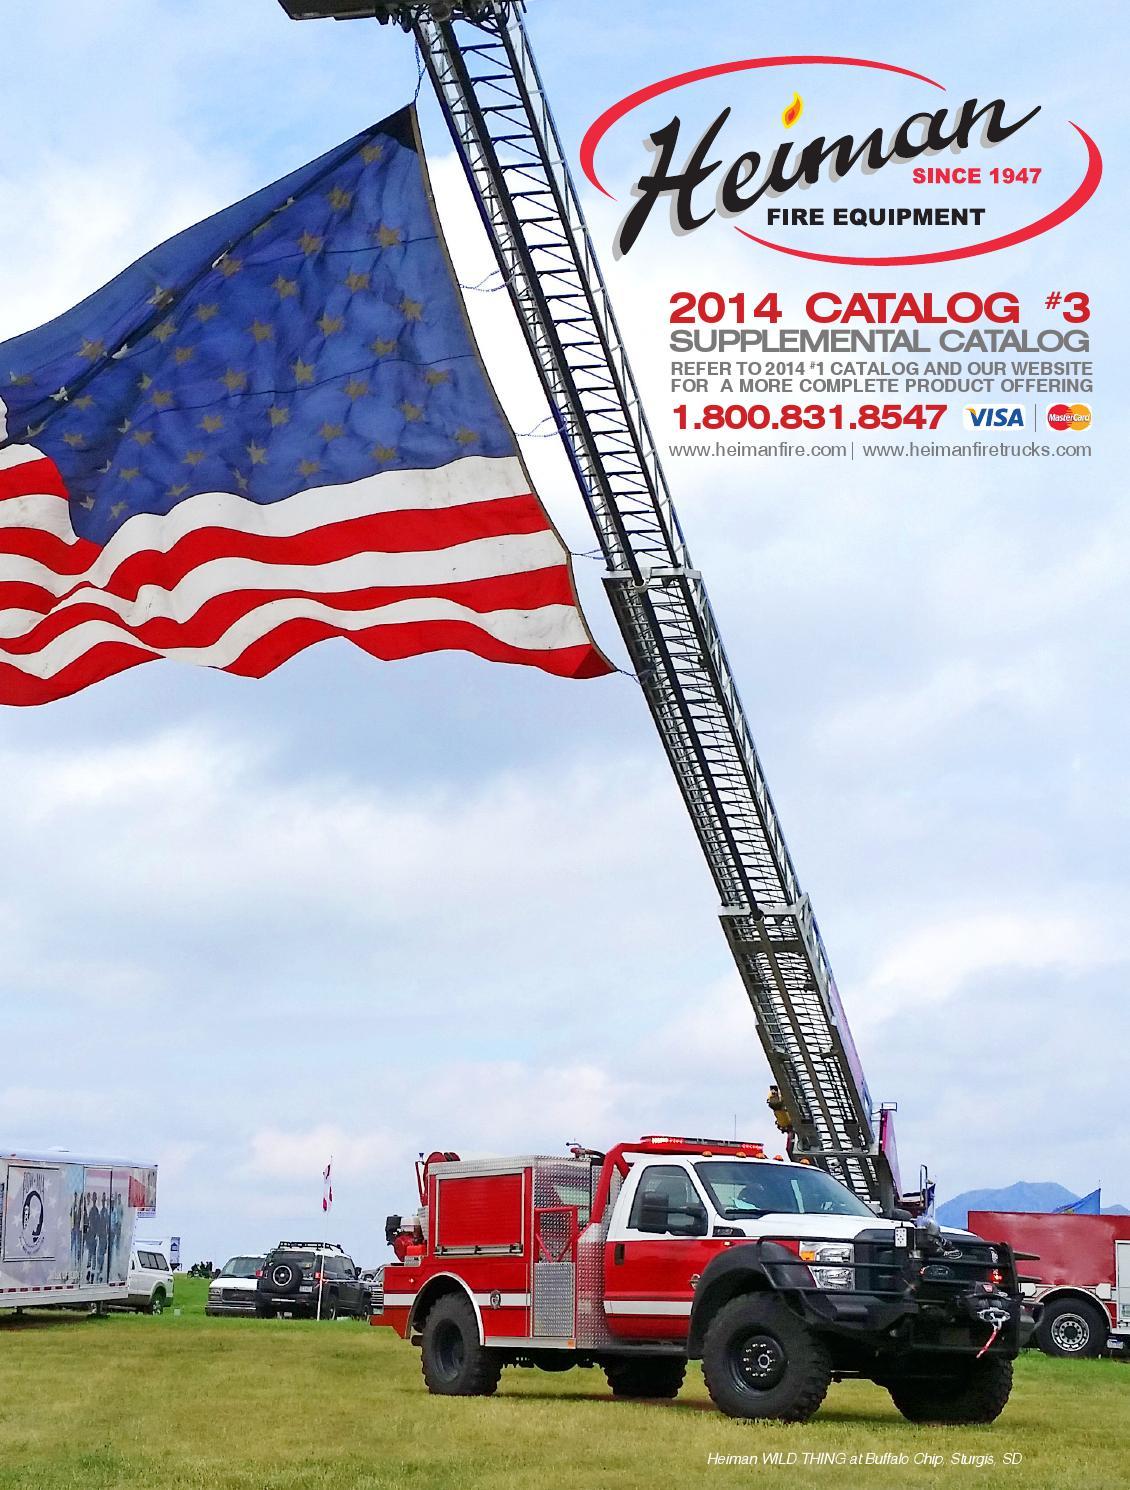 2014 3 Supplemental Catalog By Heiman Fire Equipment Issuu Pot Pro Circuit Works Husqvarna